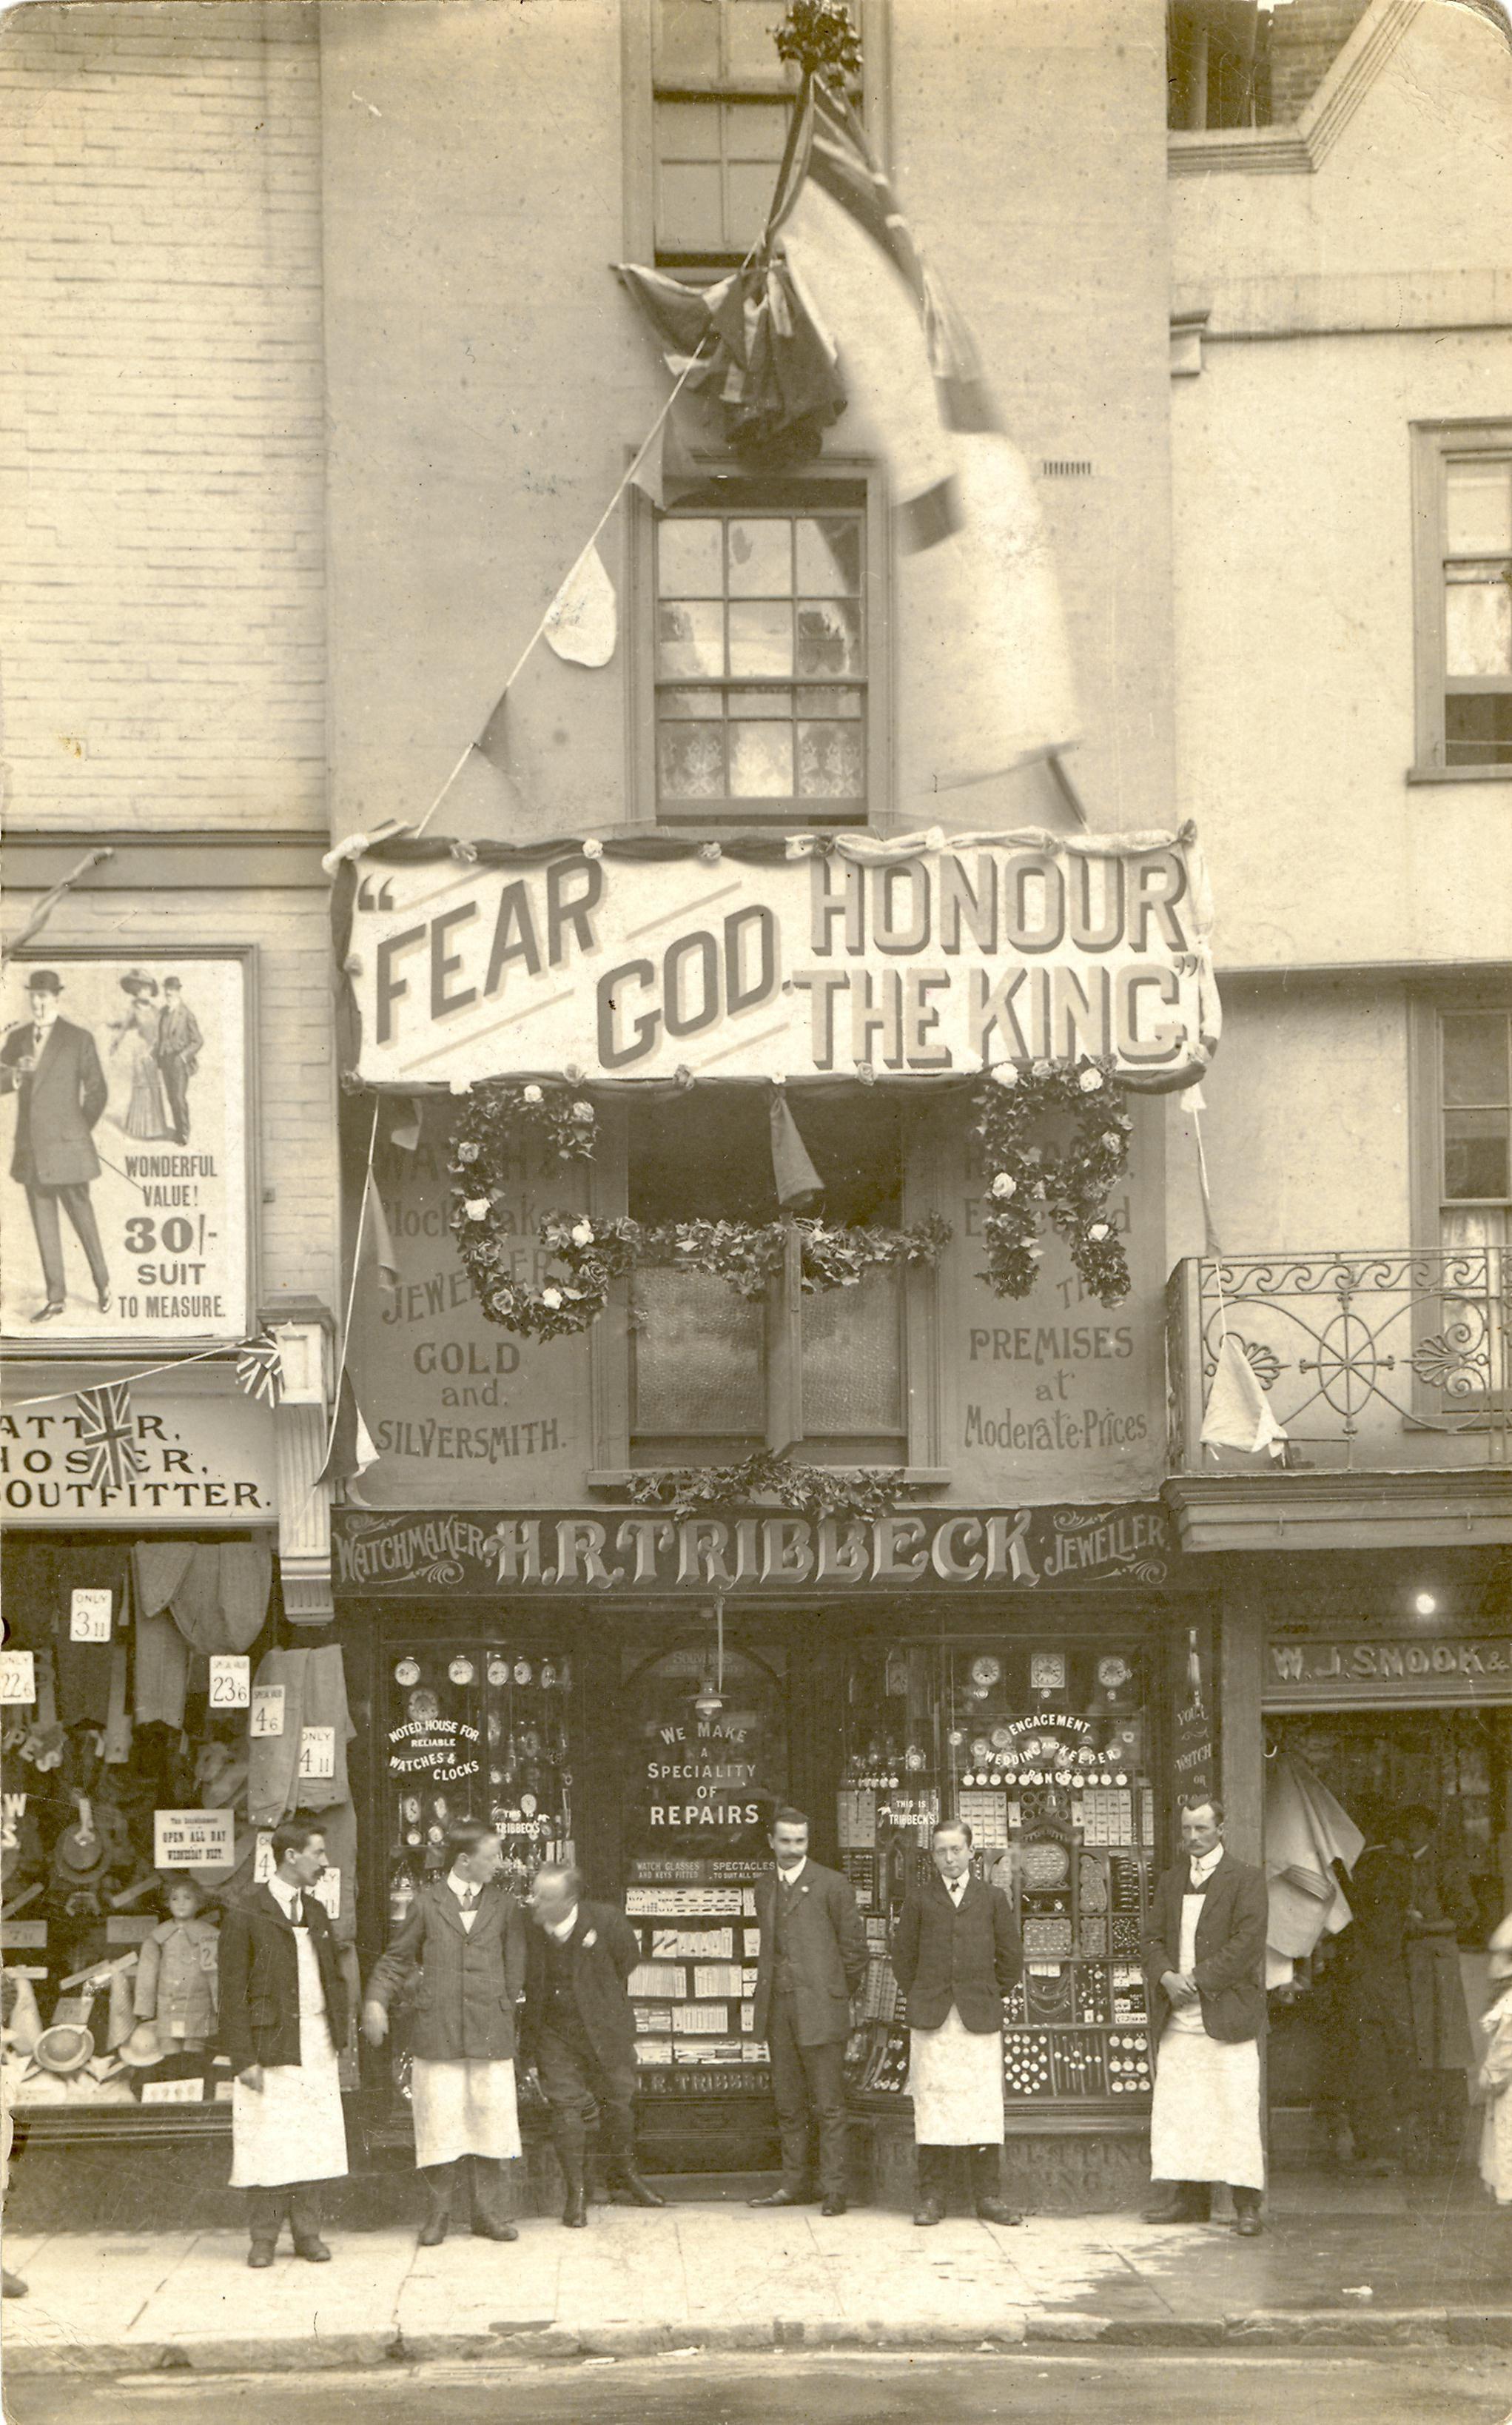 Tribbecks Jewellers Shopfront in Salisbury, UK @1911.